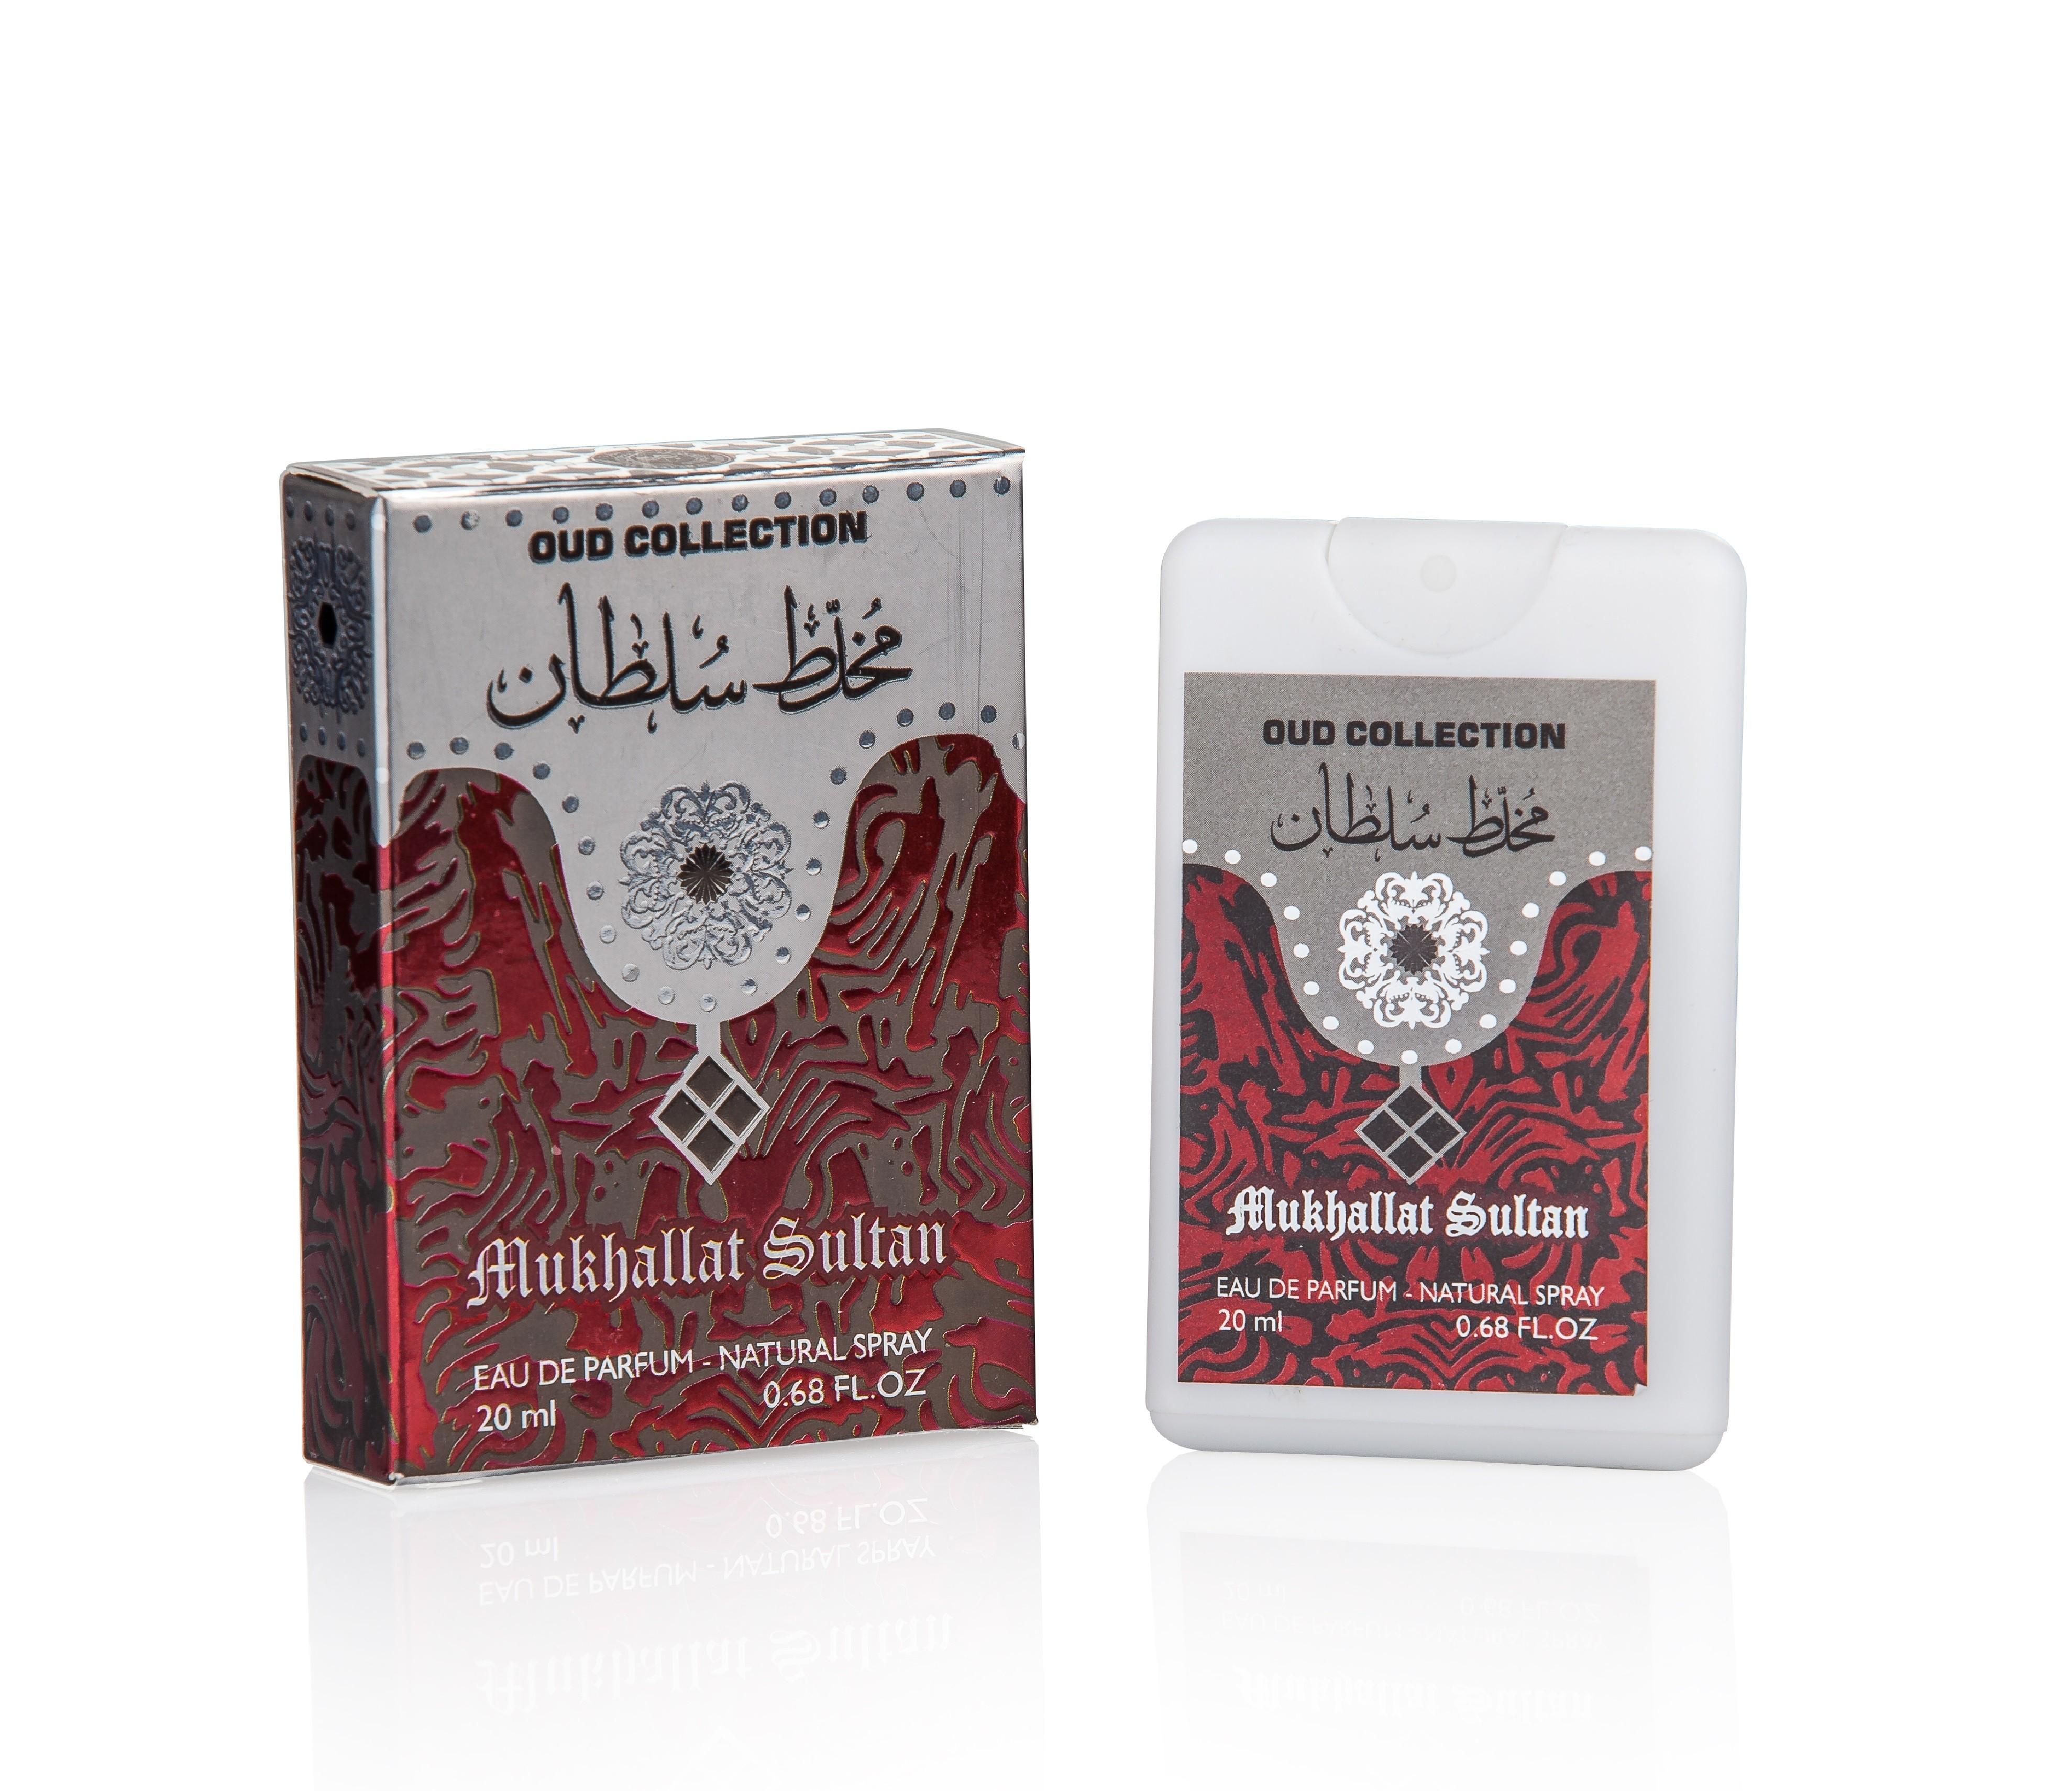 Mukhallat Sultan 20 ml